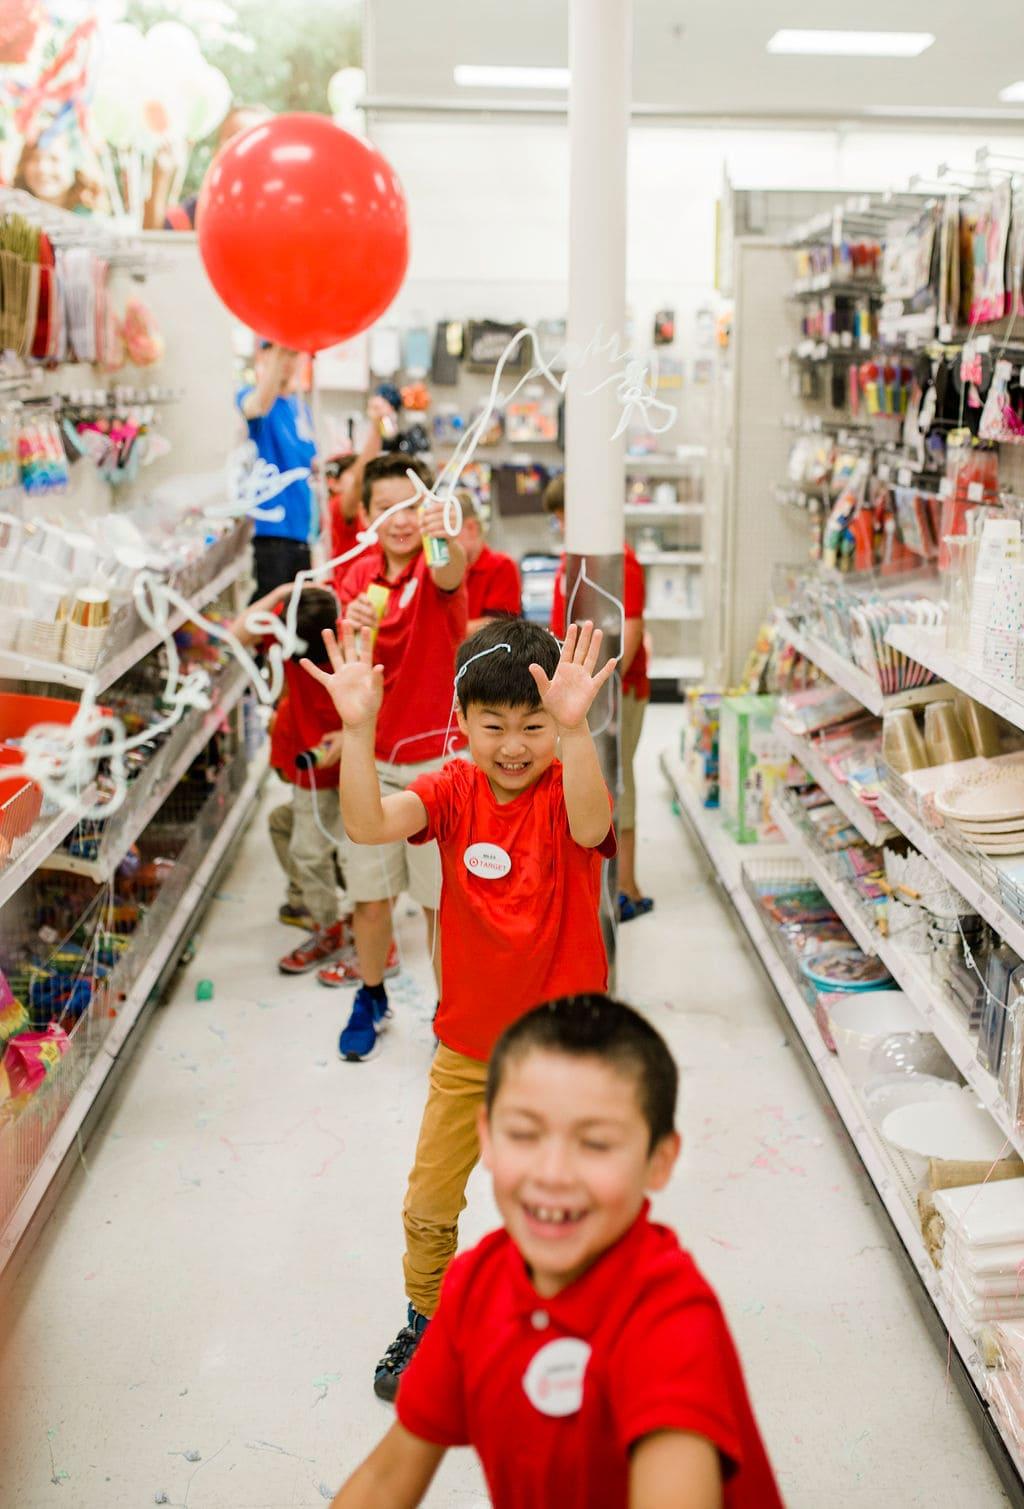 kids running in an aisle